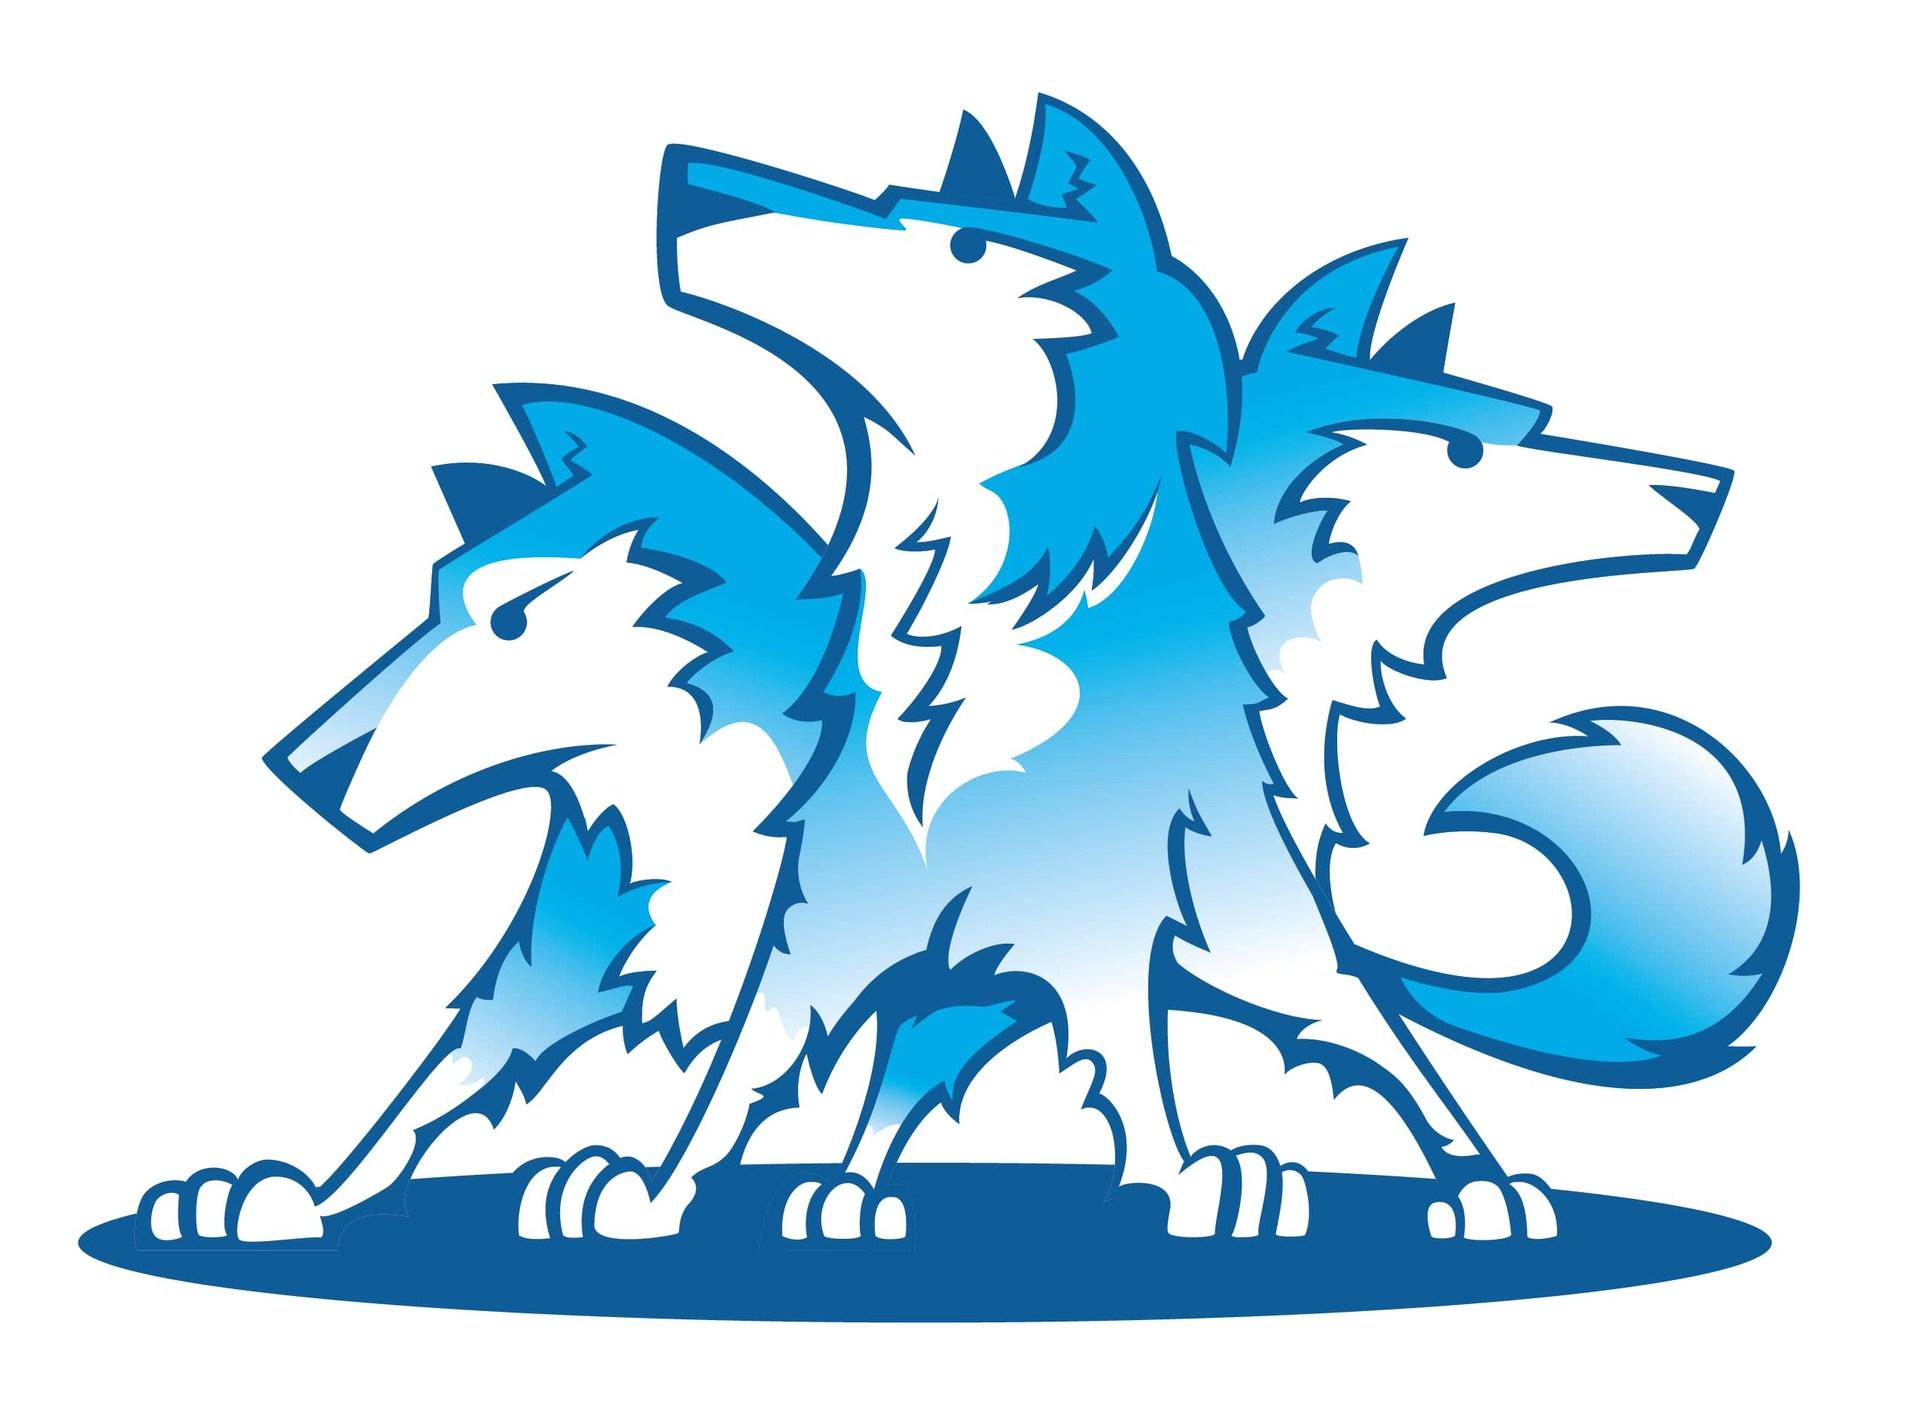 APEX wolf logo